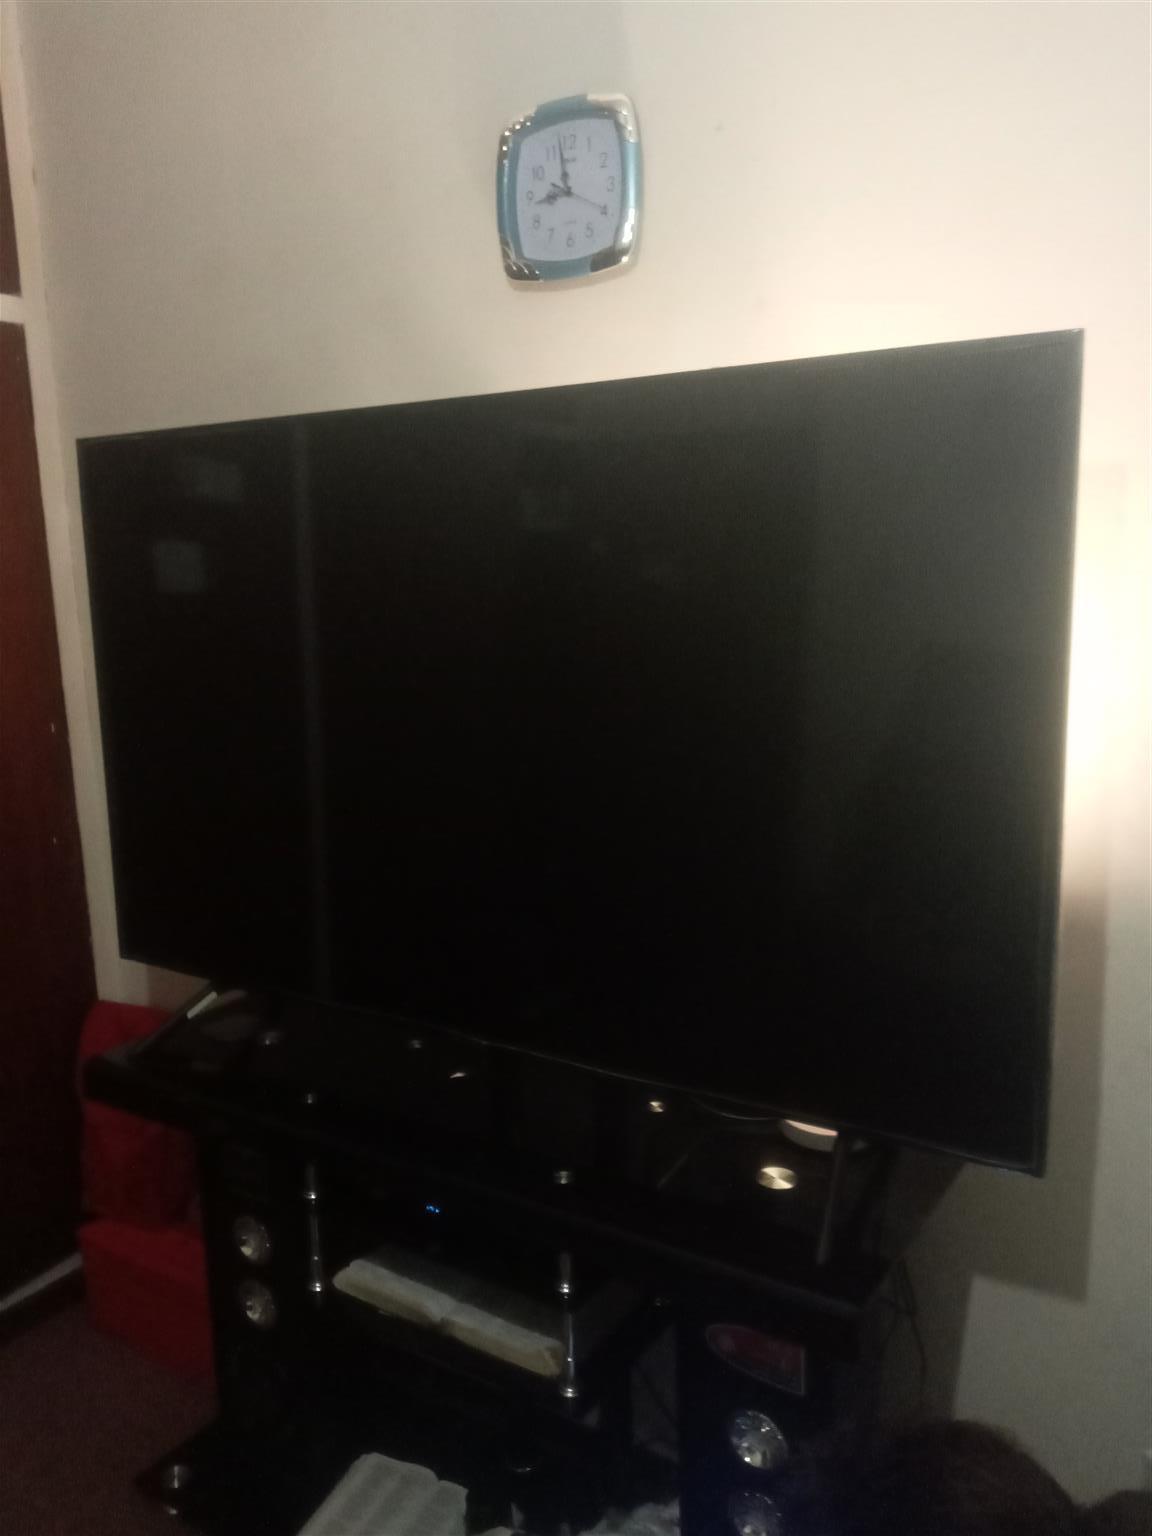 65inch Samsung Plasma TV still in very good condition have for 16months still in